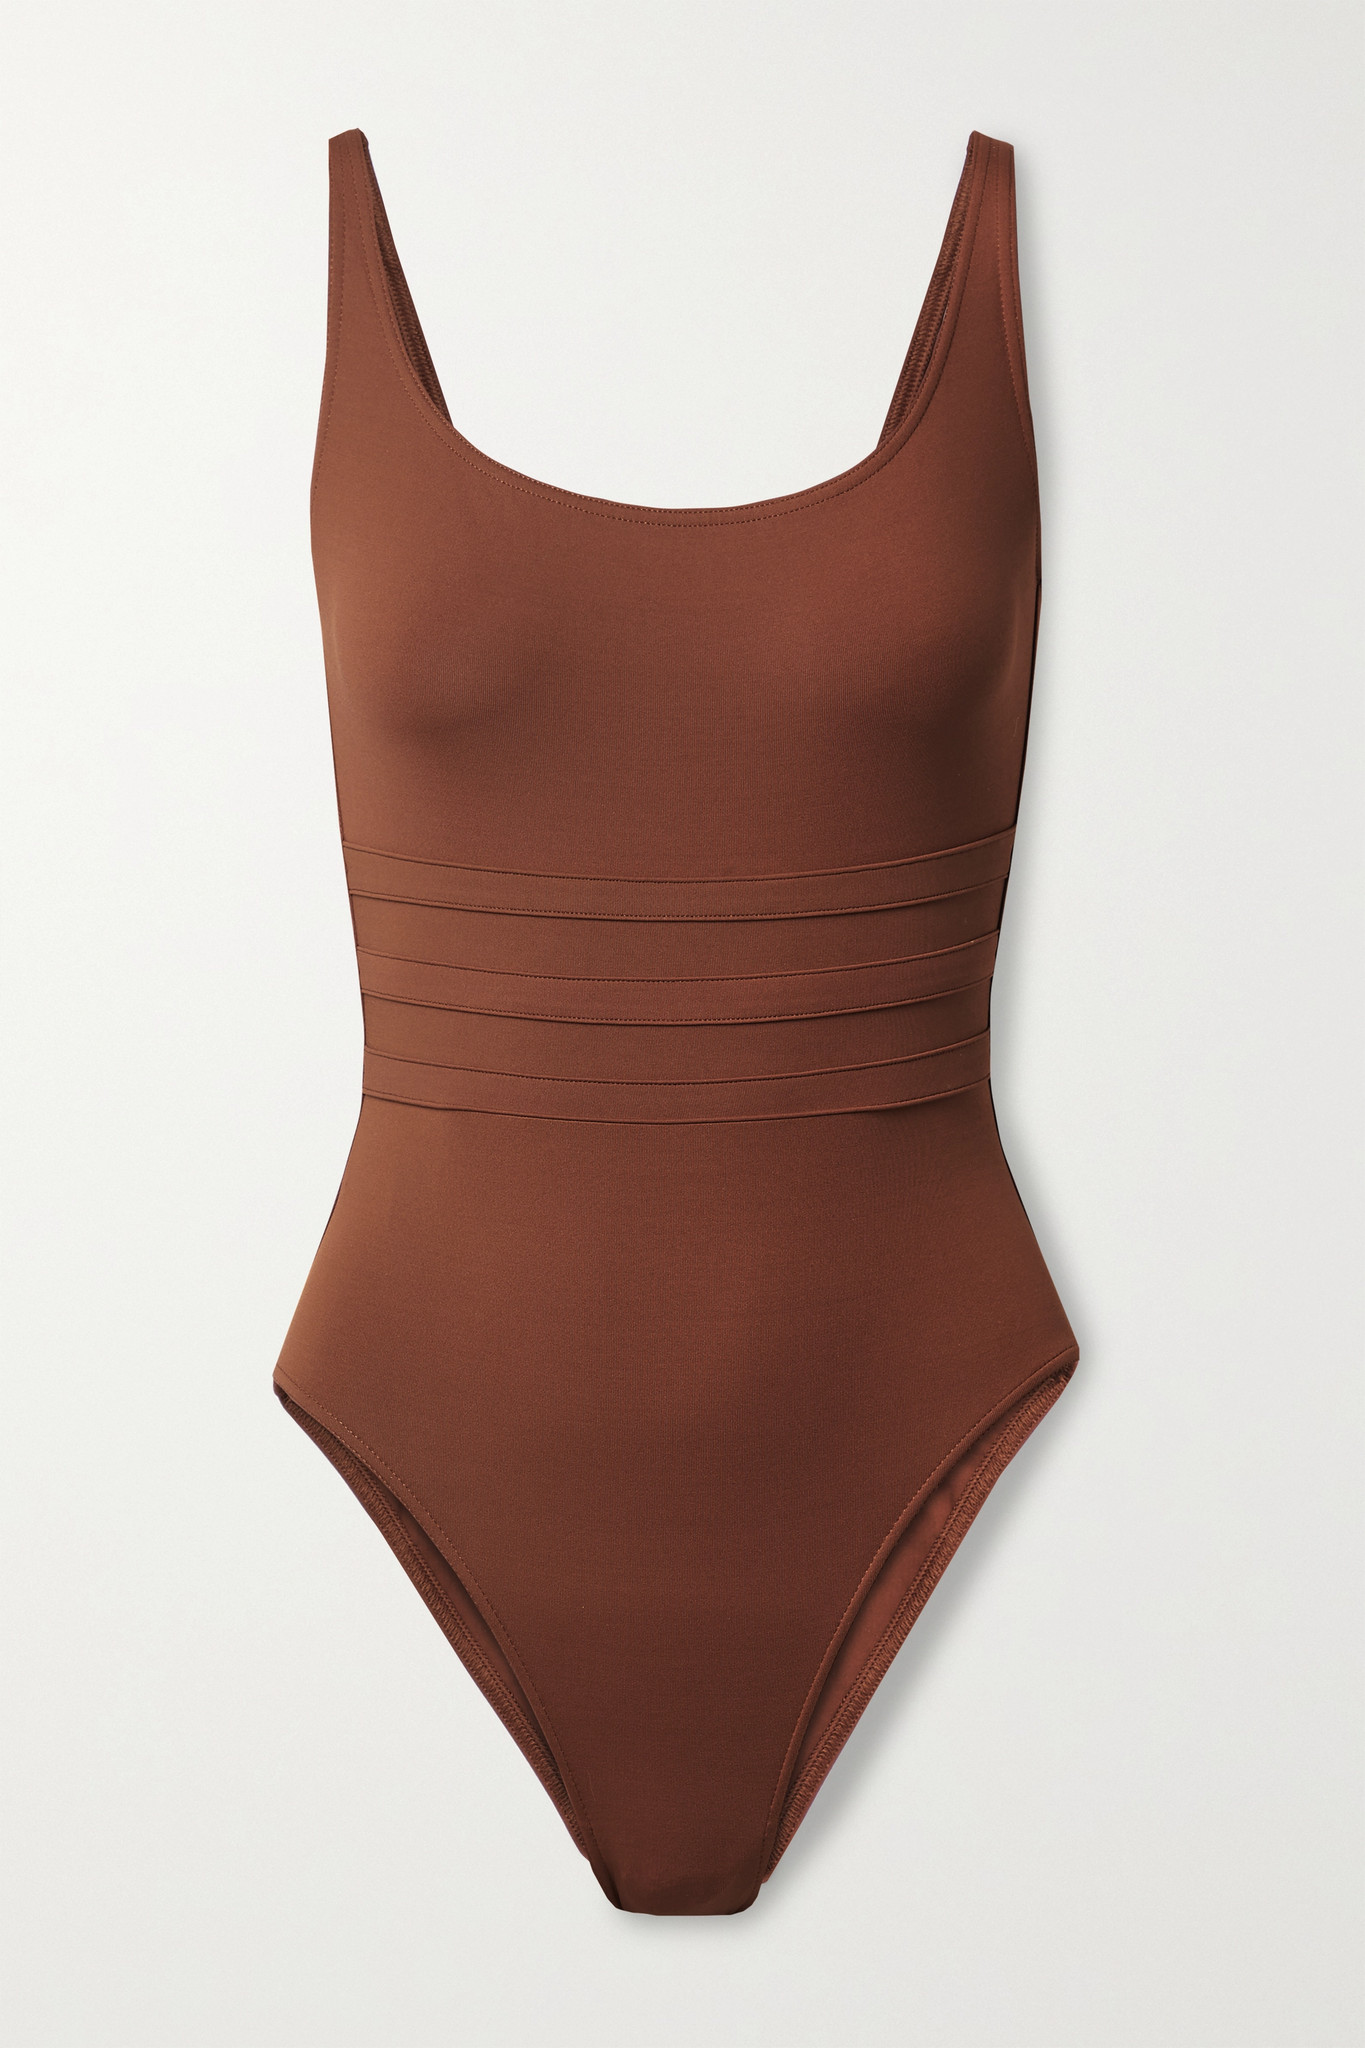 ERES - Les Essentials Asia Swimsuit - Brown - FR38